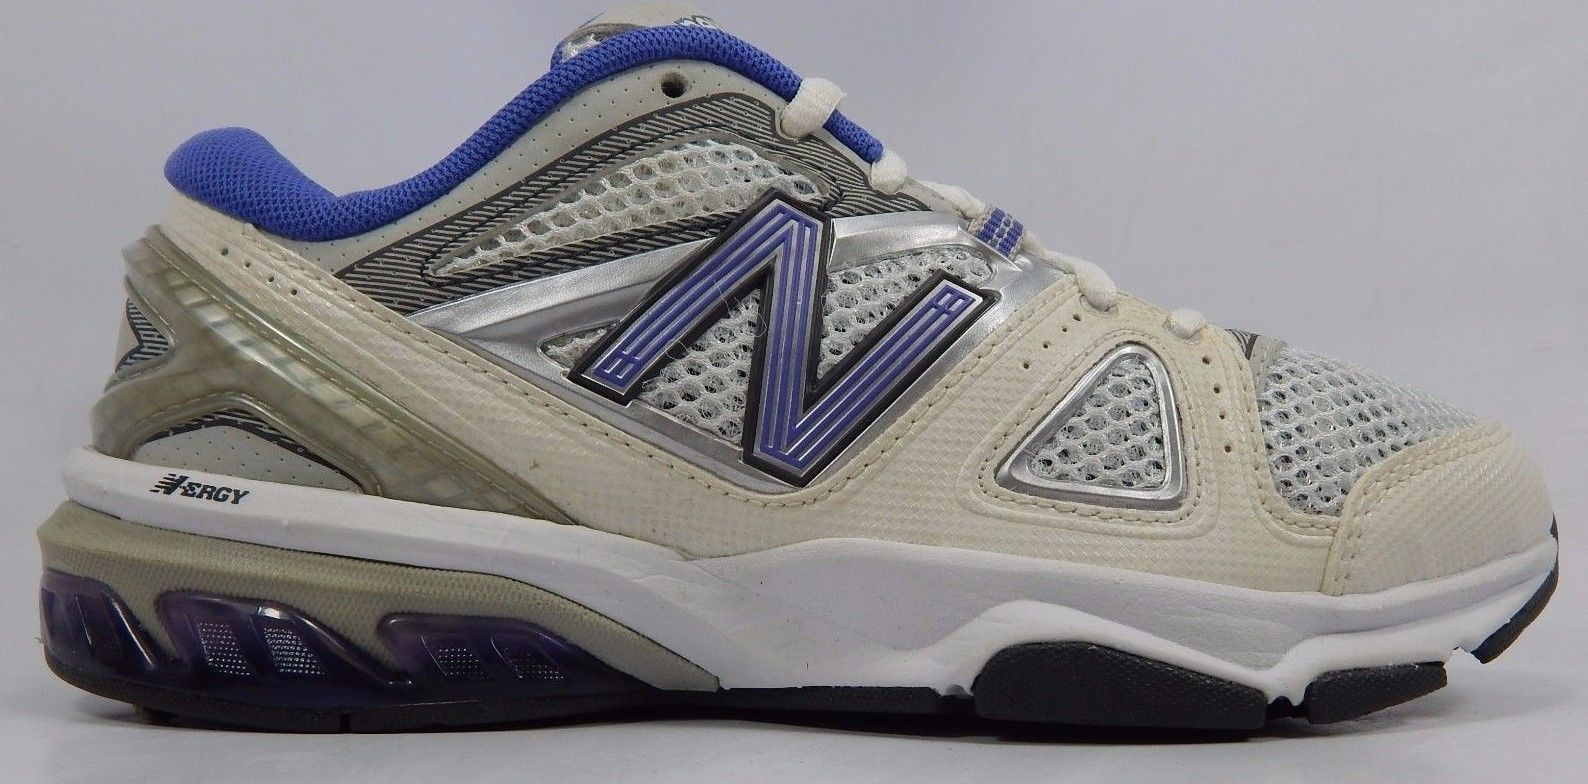 New Balance 1012 Women's Cross Training Shoes Size US 6.5 M (B) EU 37 WX1012WB